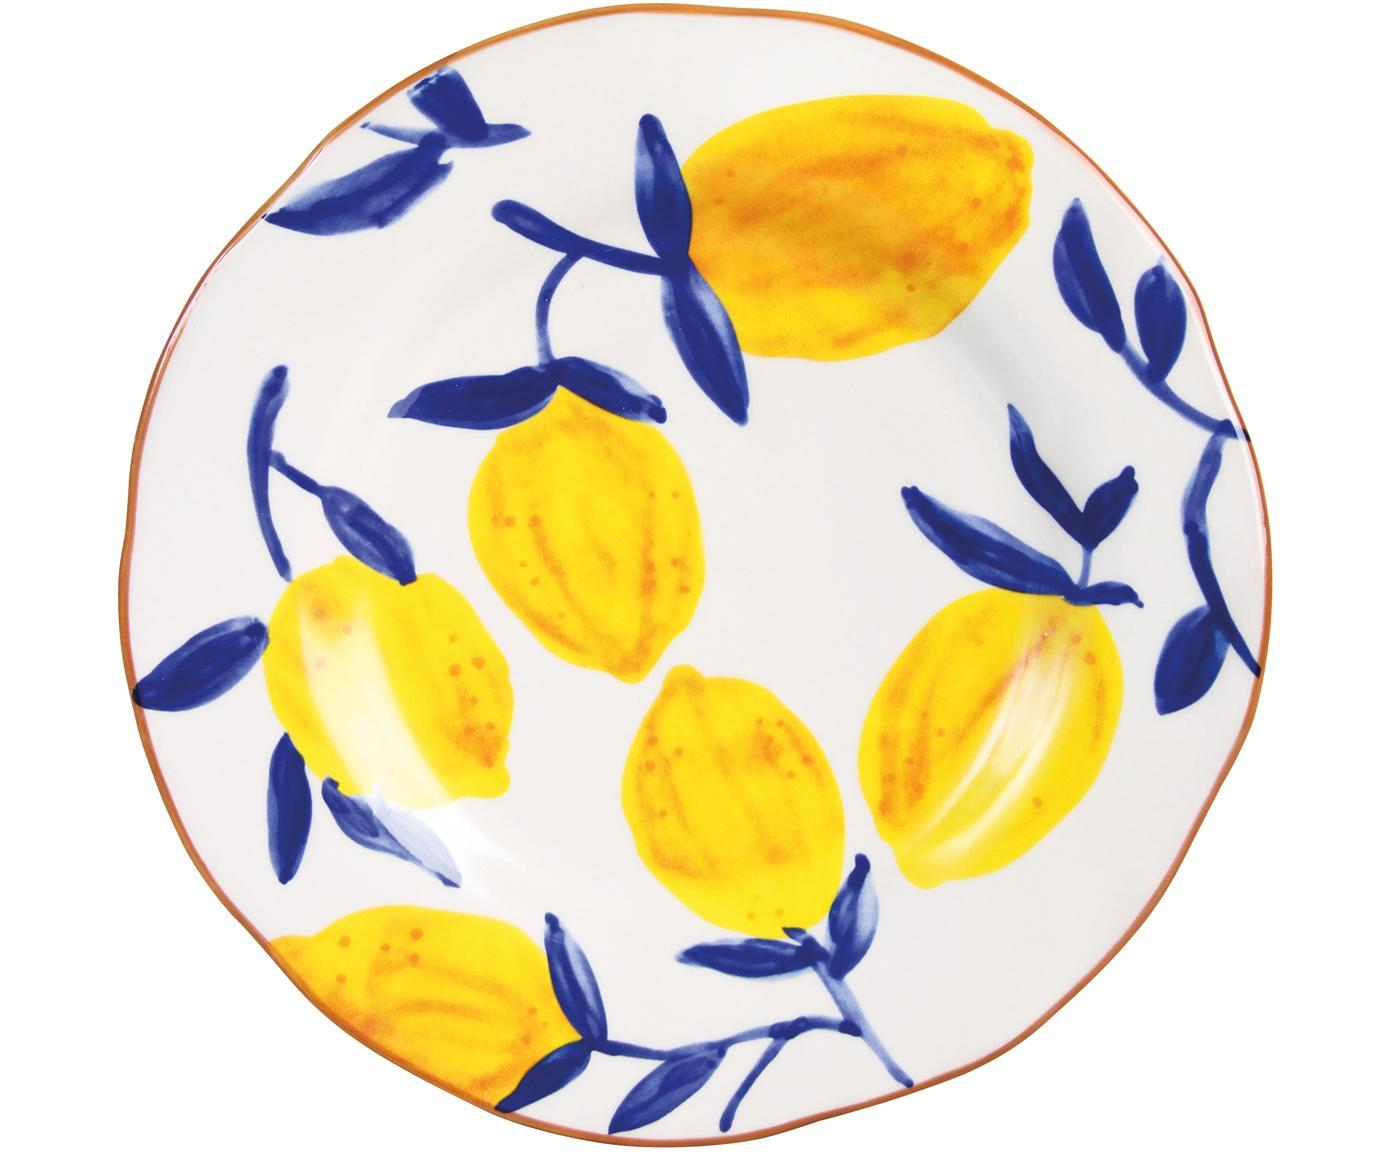 Ontbijtbordenset Lemon Twig, 4-delig, Keramiek, Multicolour, Ø 22 cm